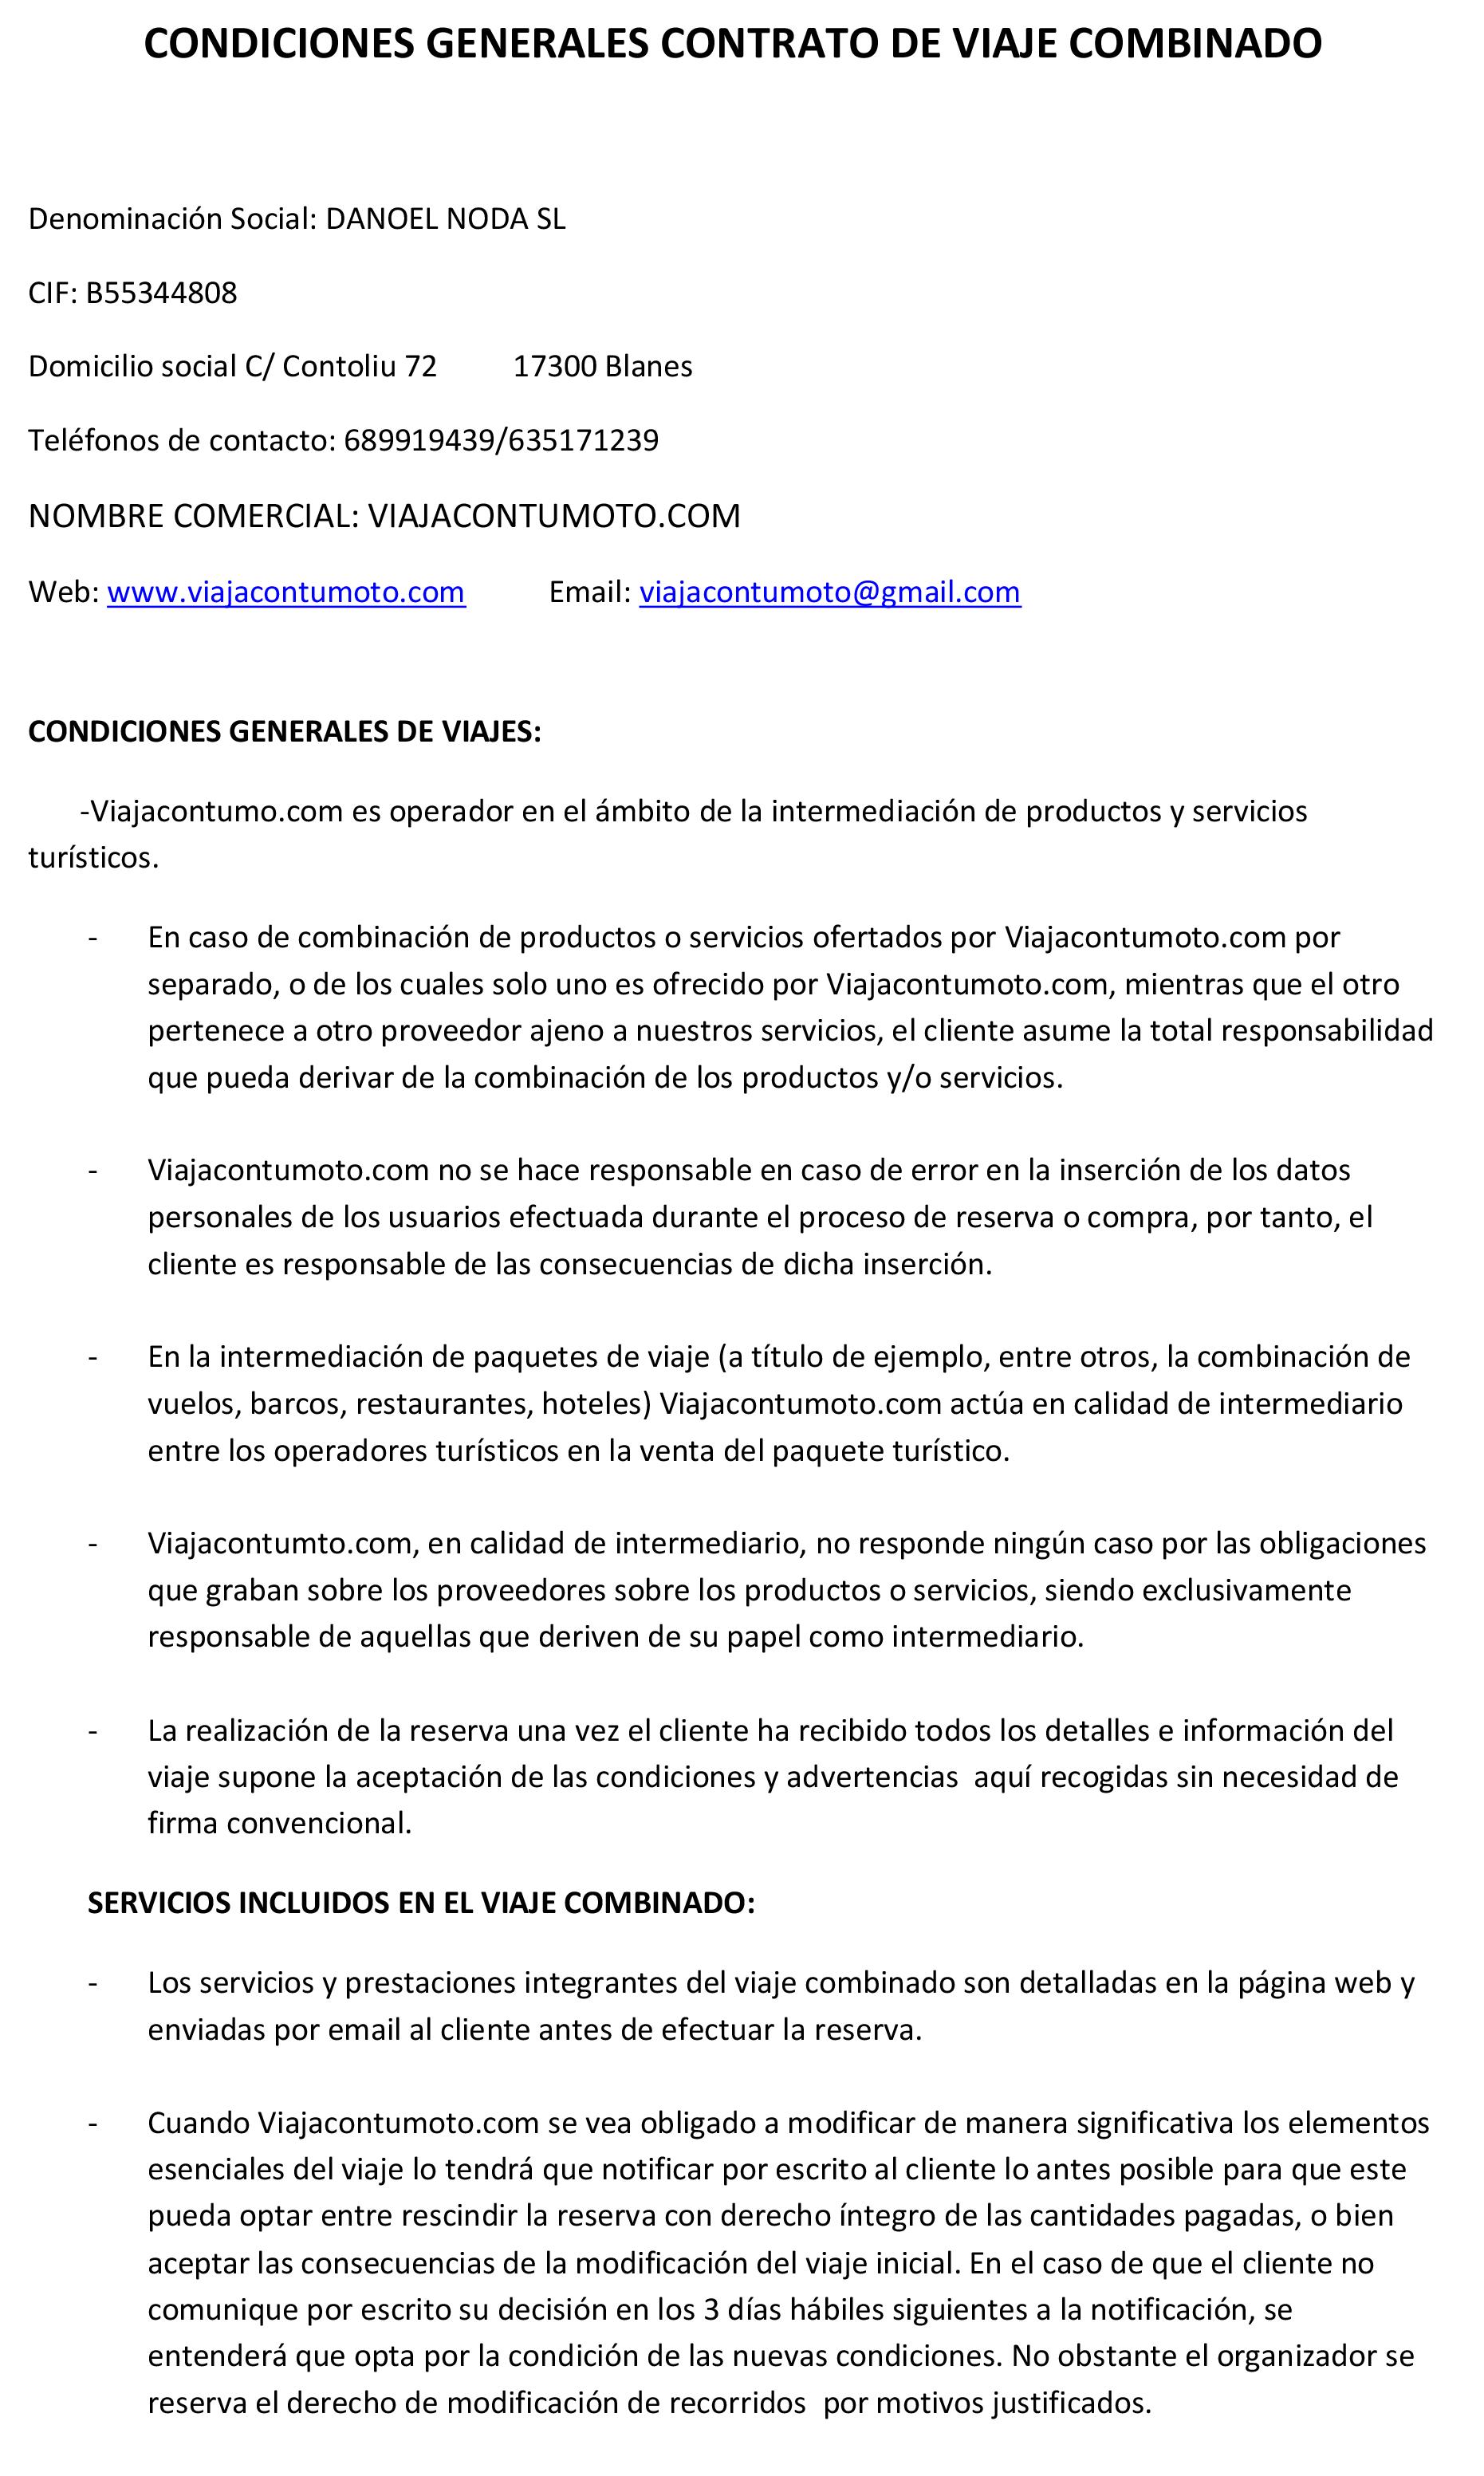 CONDICIONES-GENERALES-DANOEL-1